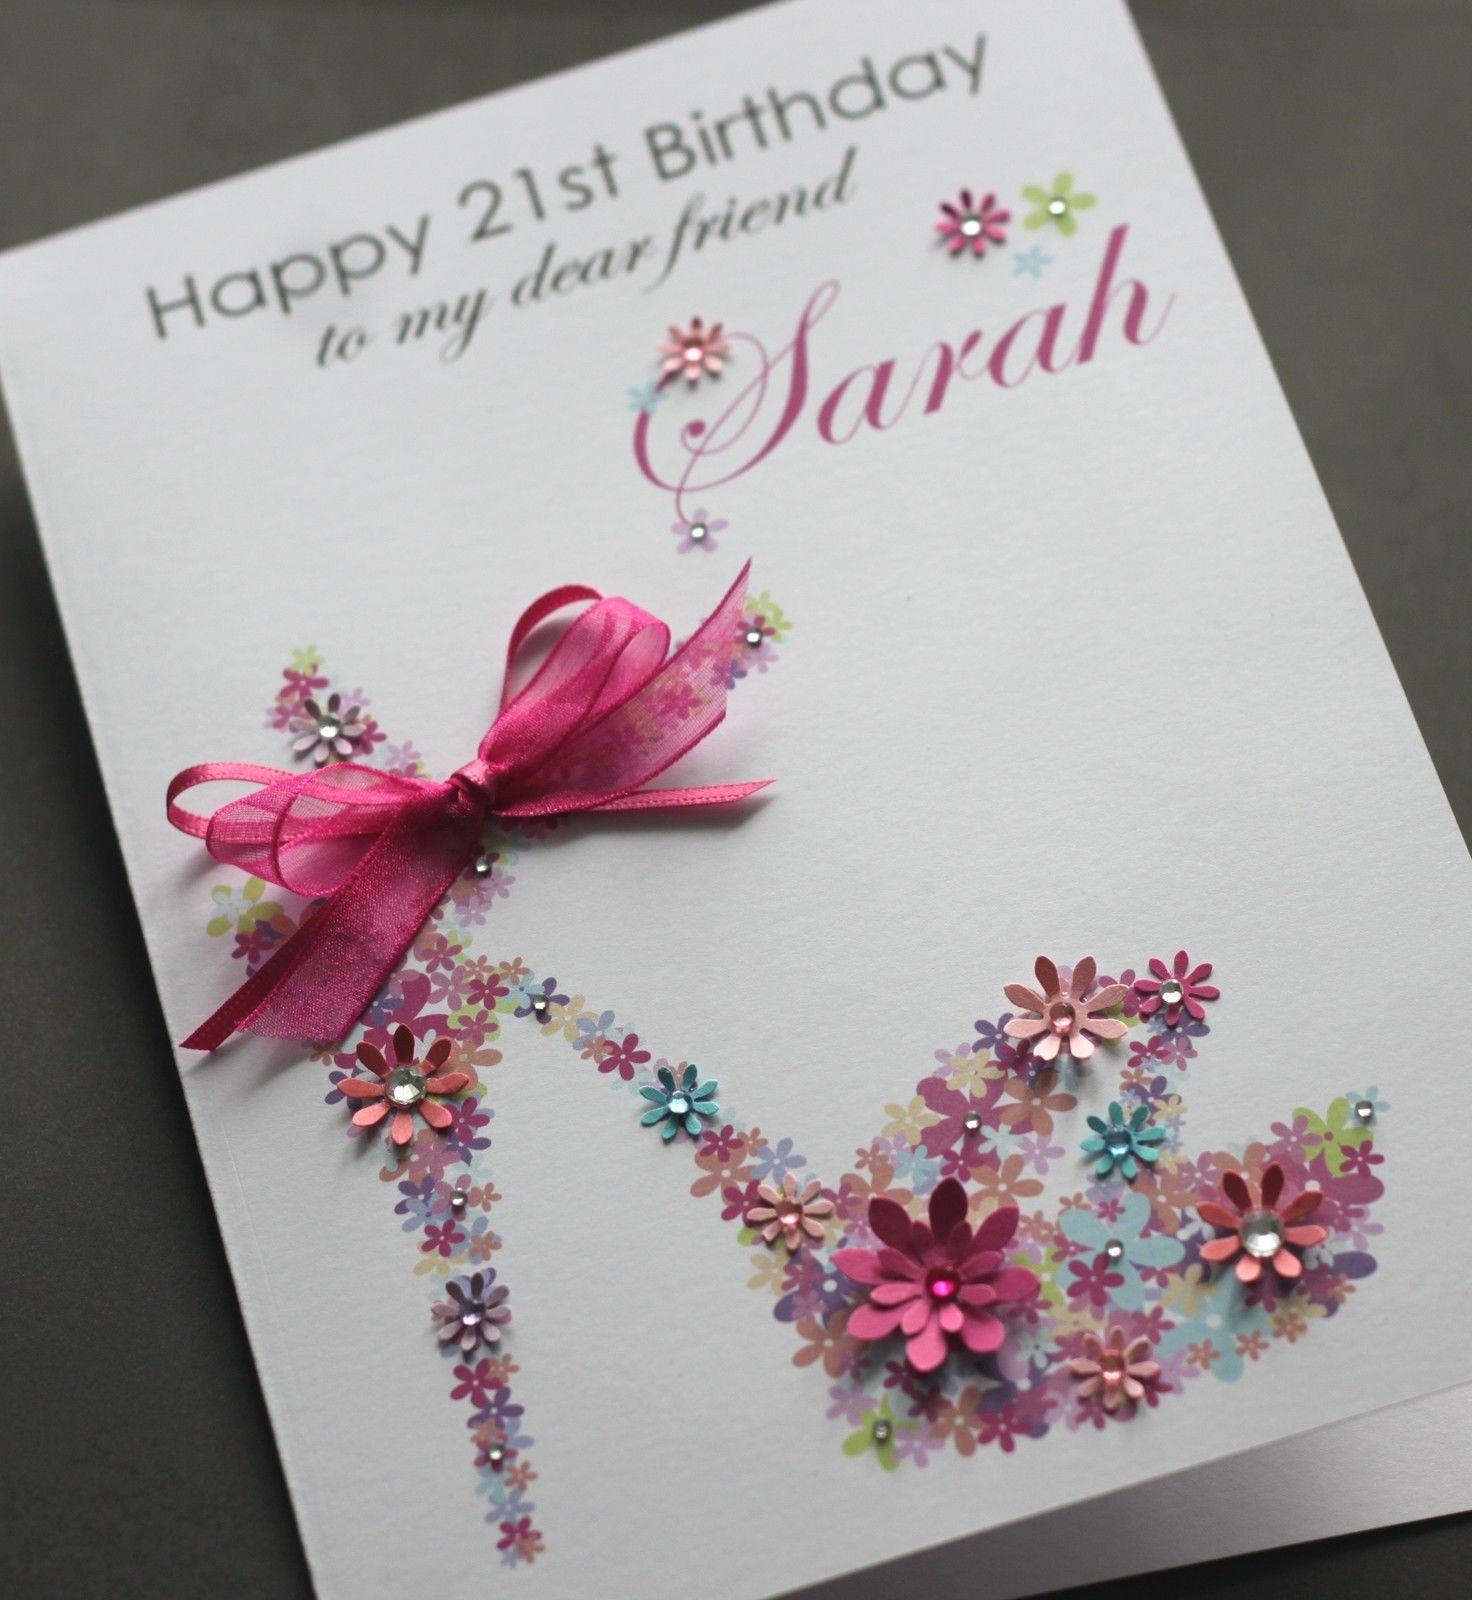 birthday card for friend handmade